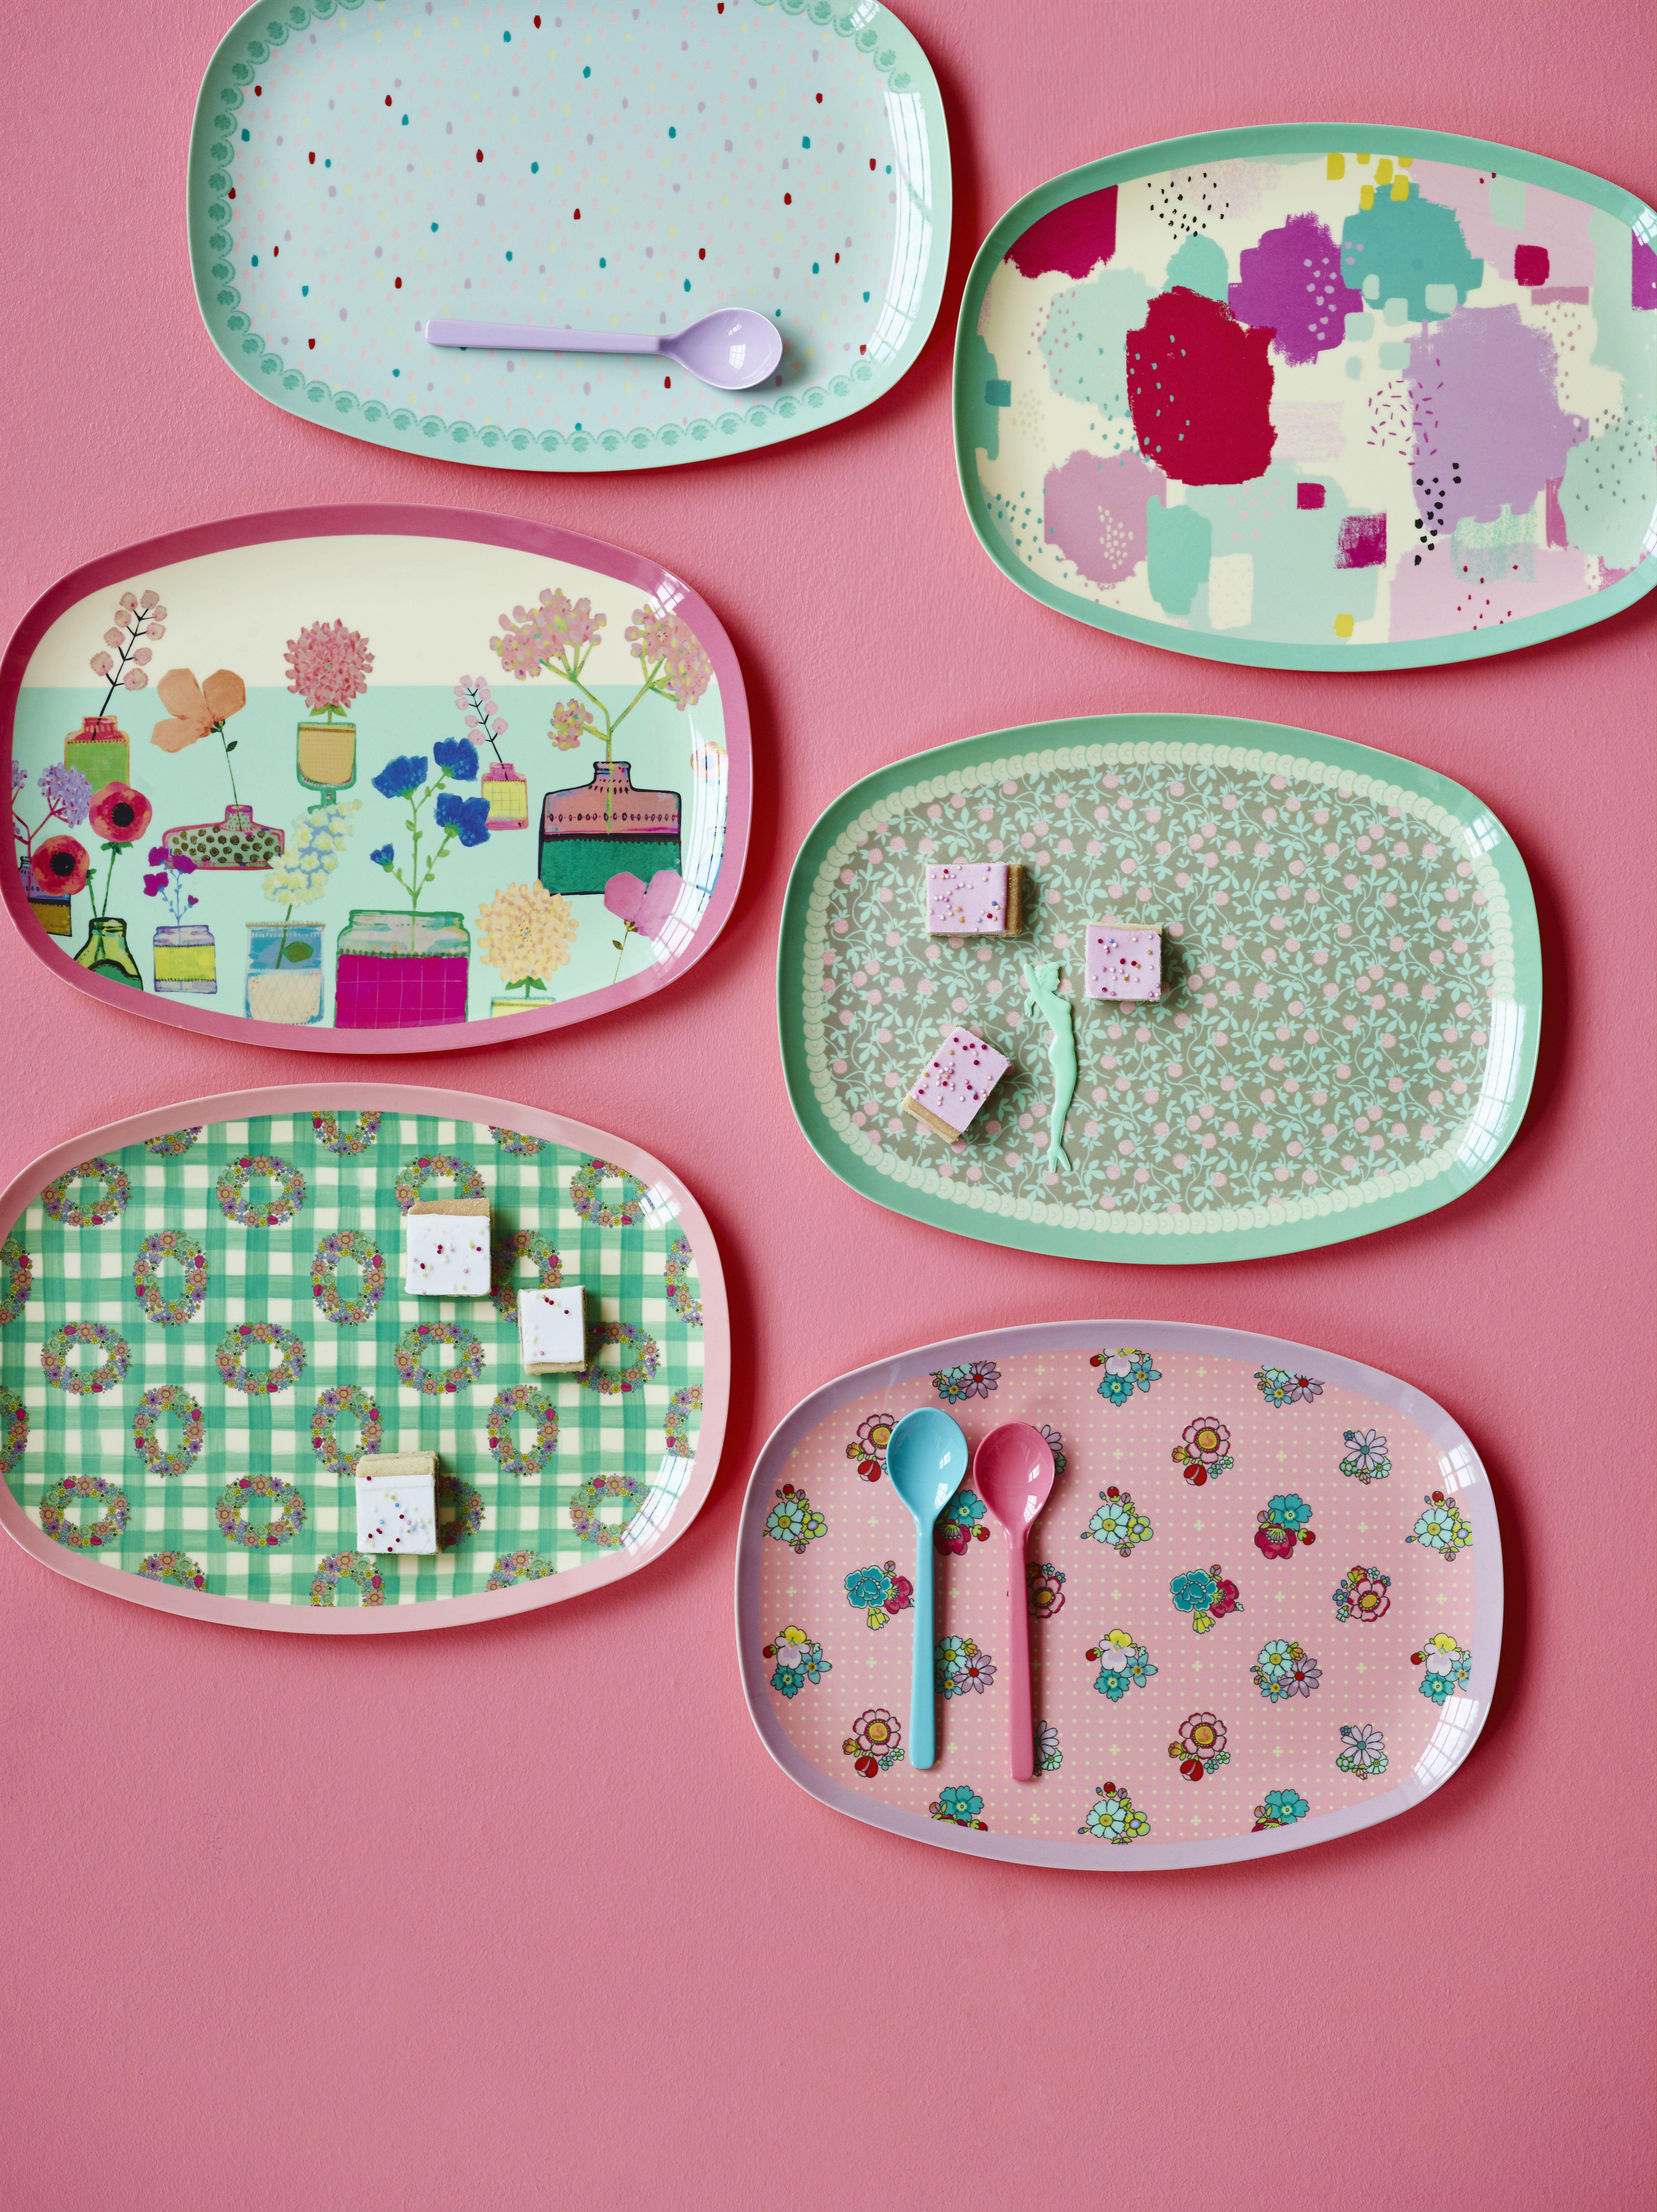 Cool Melamine Plates - AW16 & Cool Melamine Plates - AW16 | Resilience | Pinterest | Tableware ...